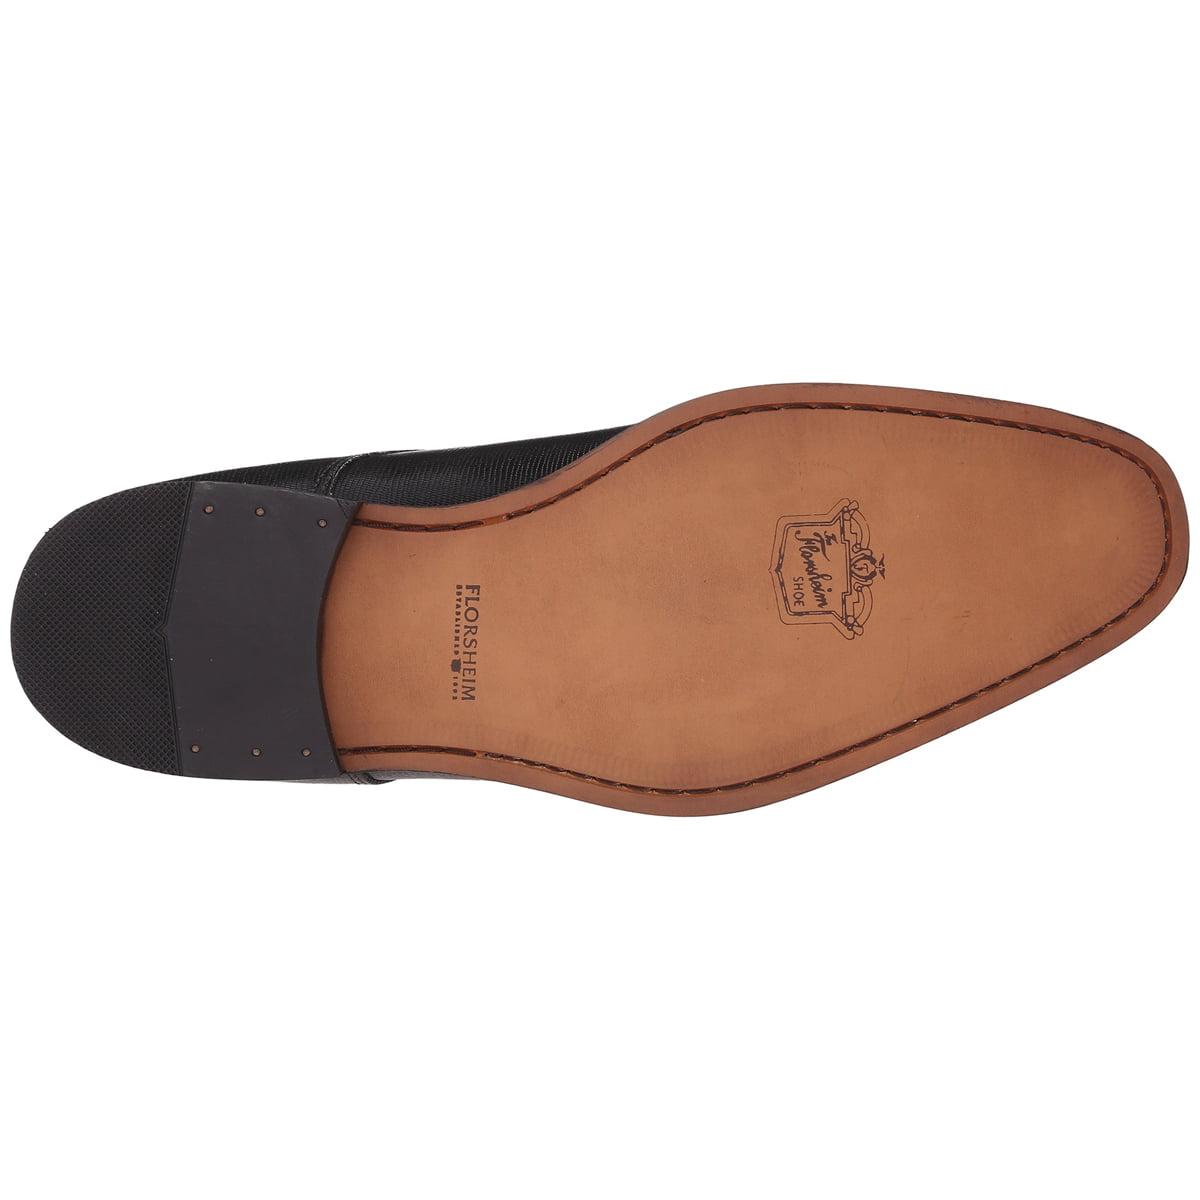 Florsheim Men Sabato Cap Ox Shoes